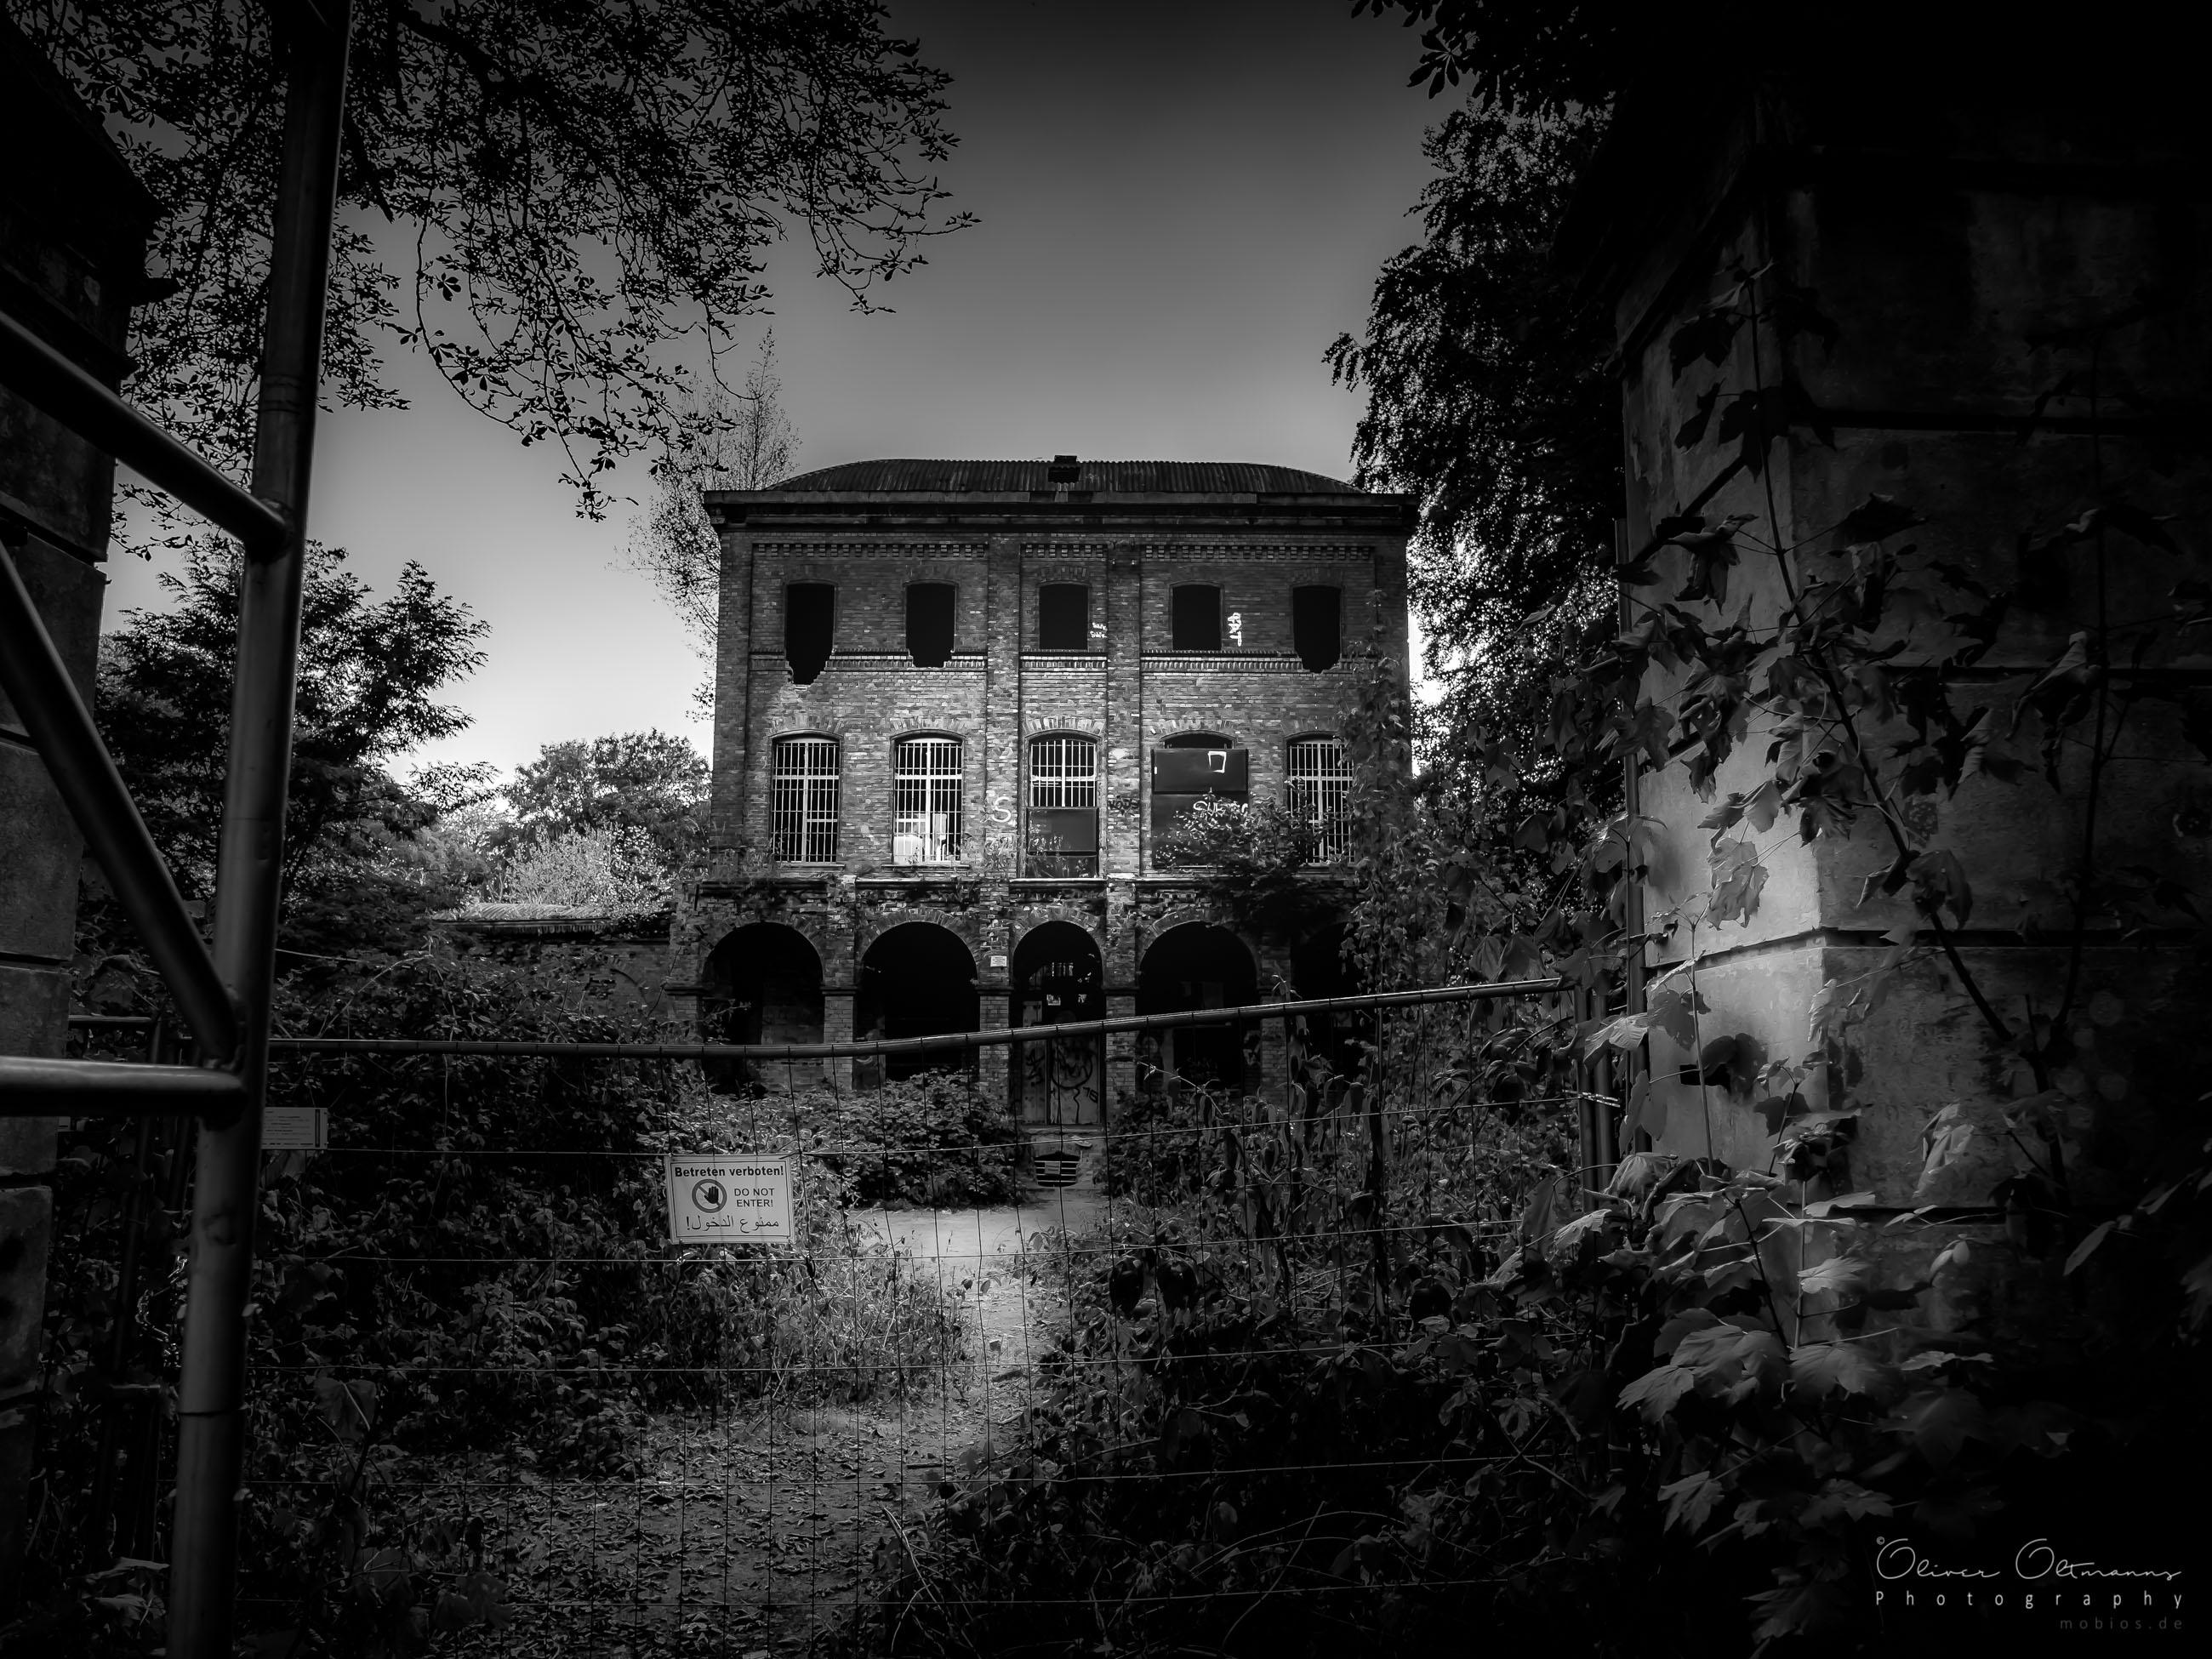 Villa Oppenheim - Das Geisterhaus